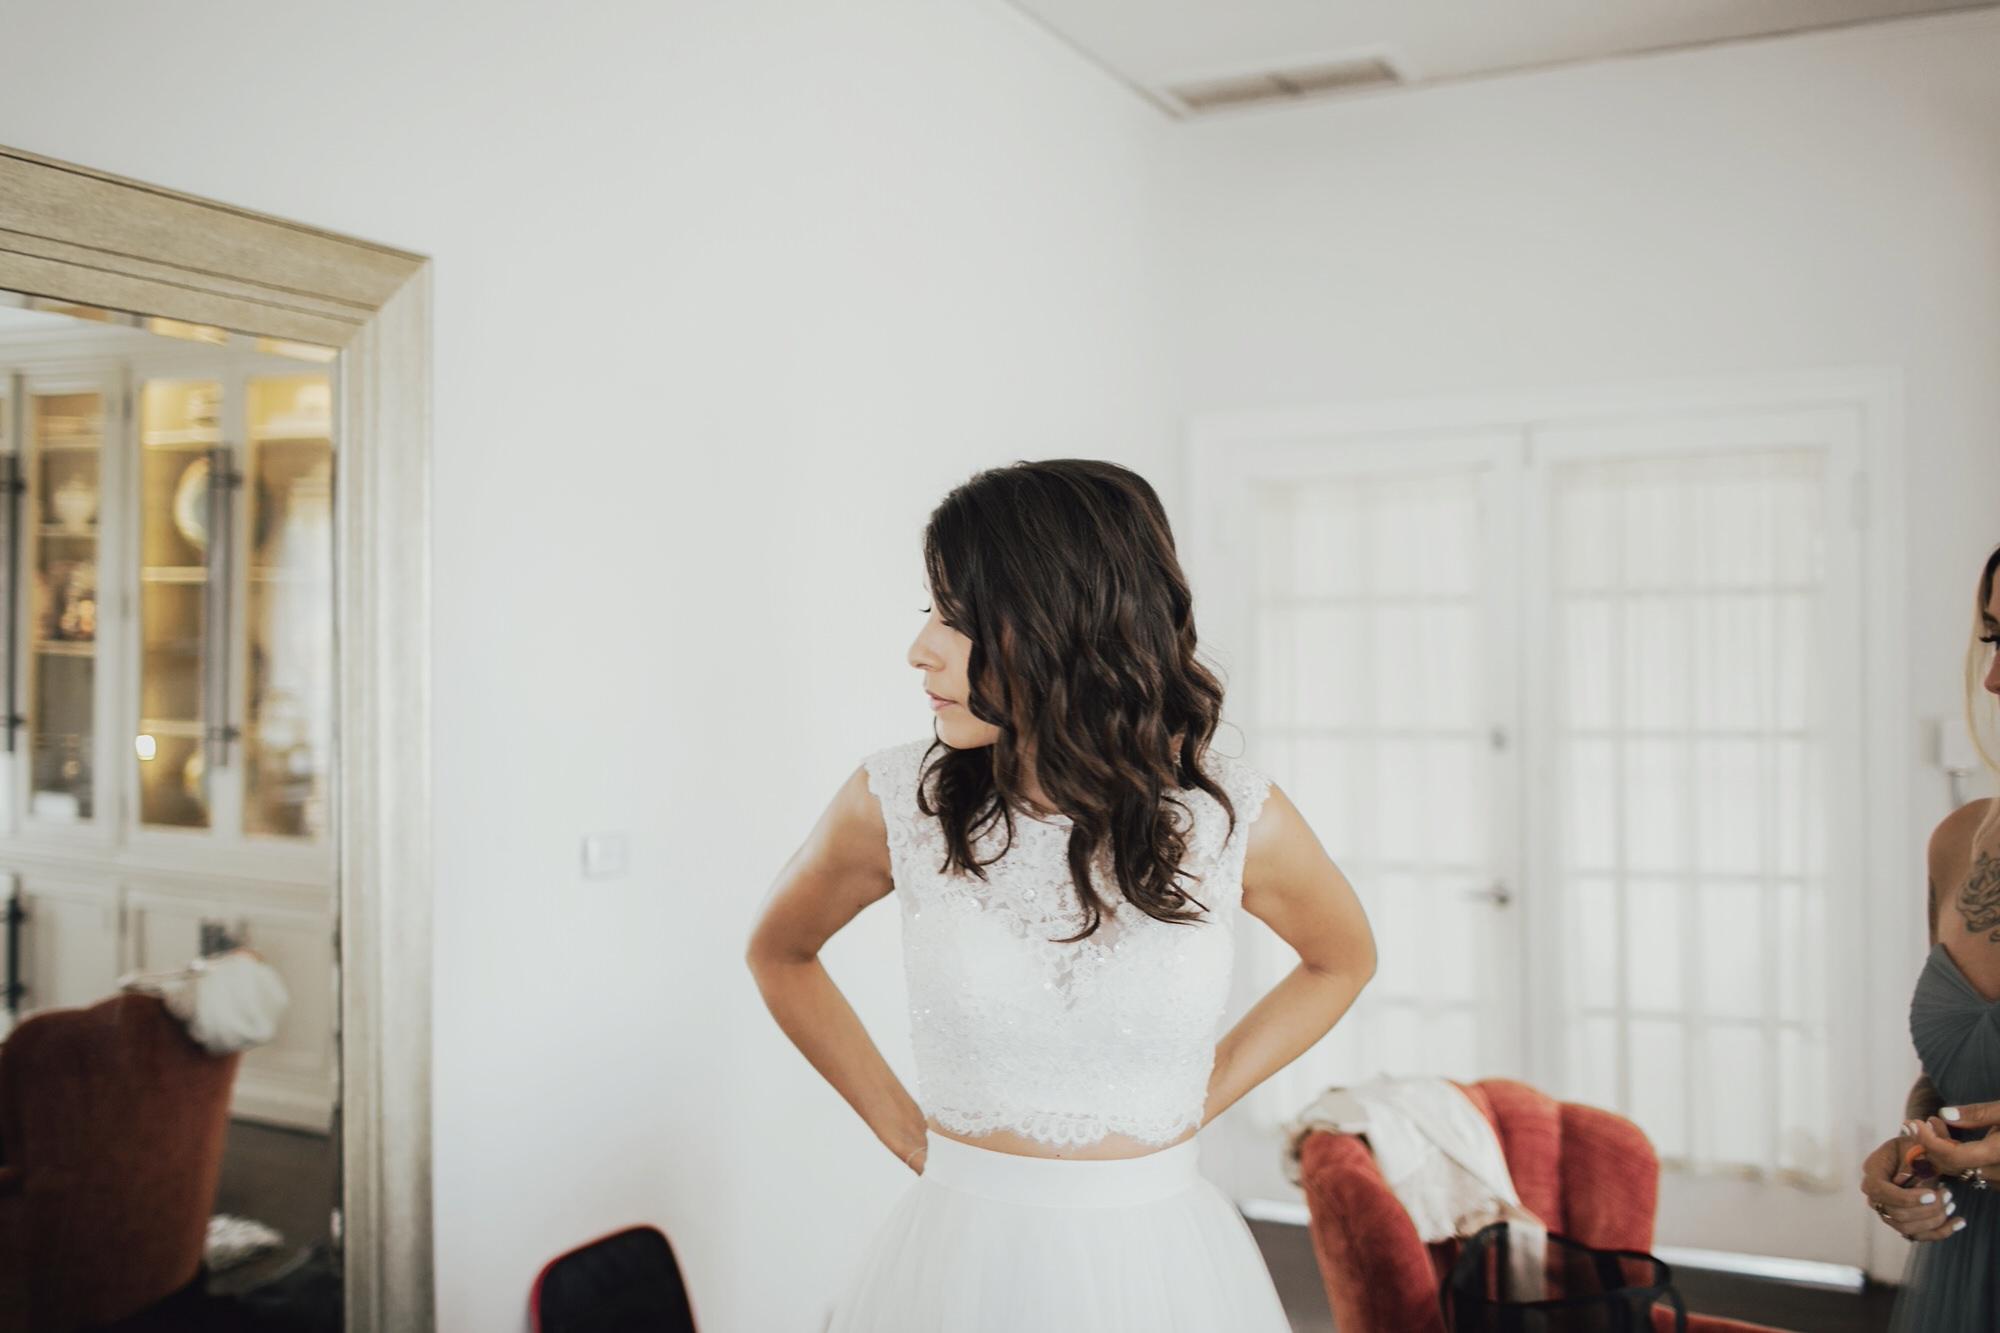 christine on her wedding day